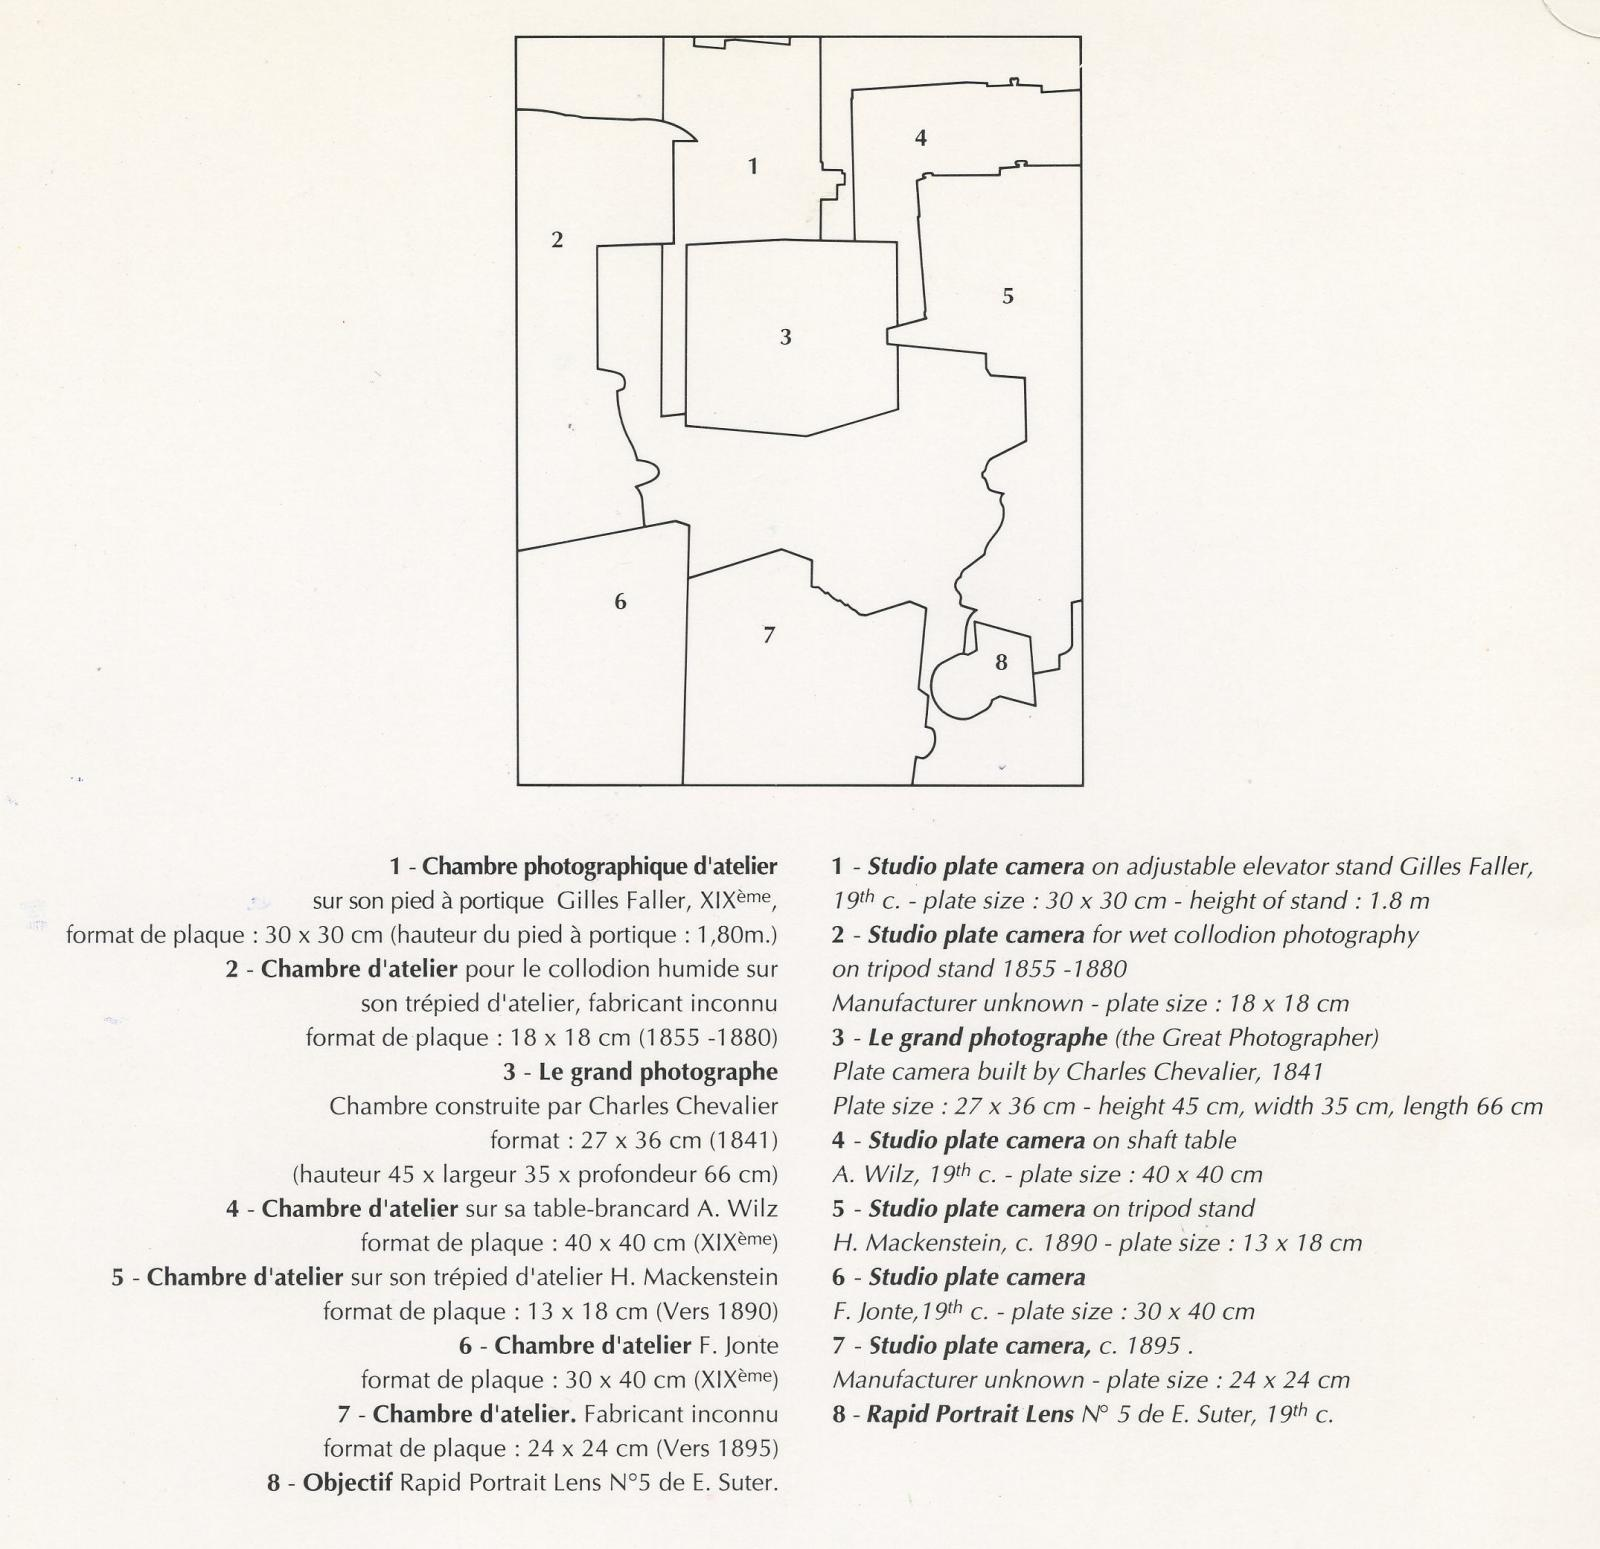 Wallpaper 3007-3 AIR FRANCE menu, collection AMI Appareils photos